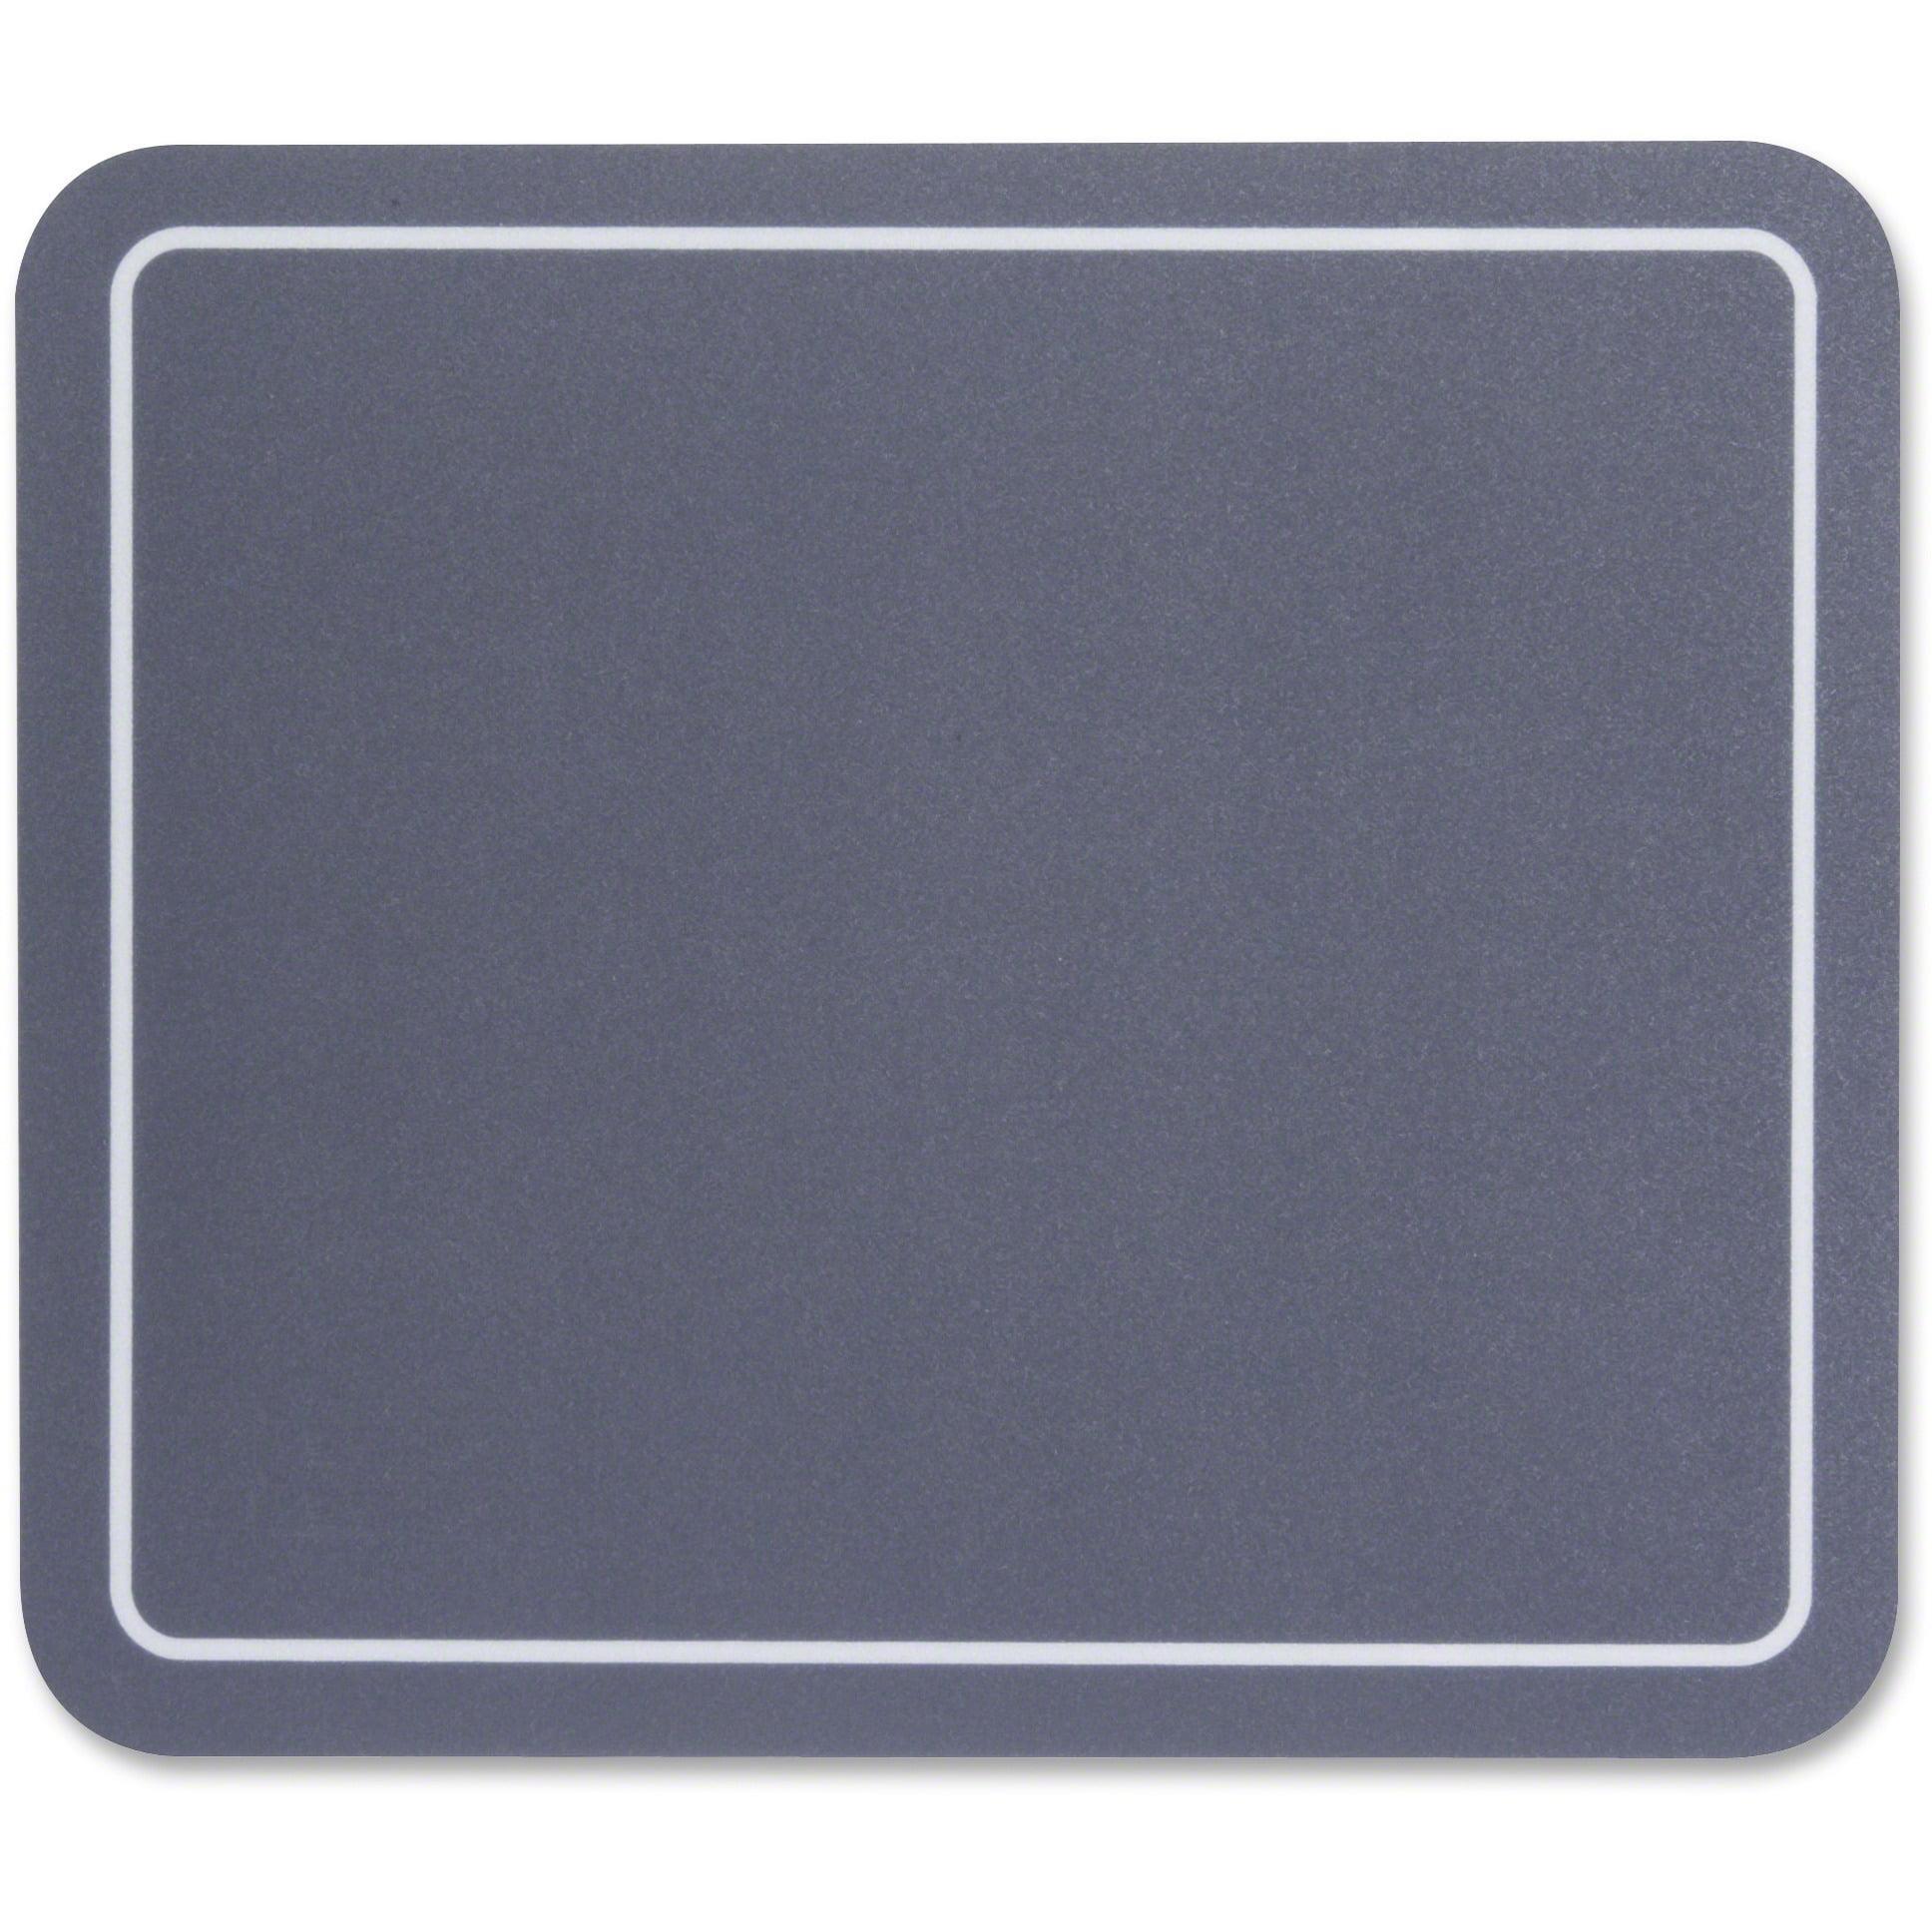 Kelly, KCS81101, SRV Precision Mouse Pad, 1, Gray